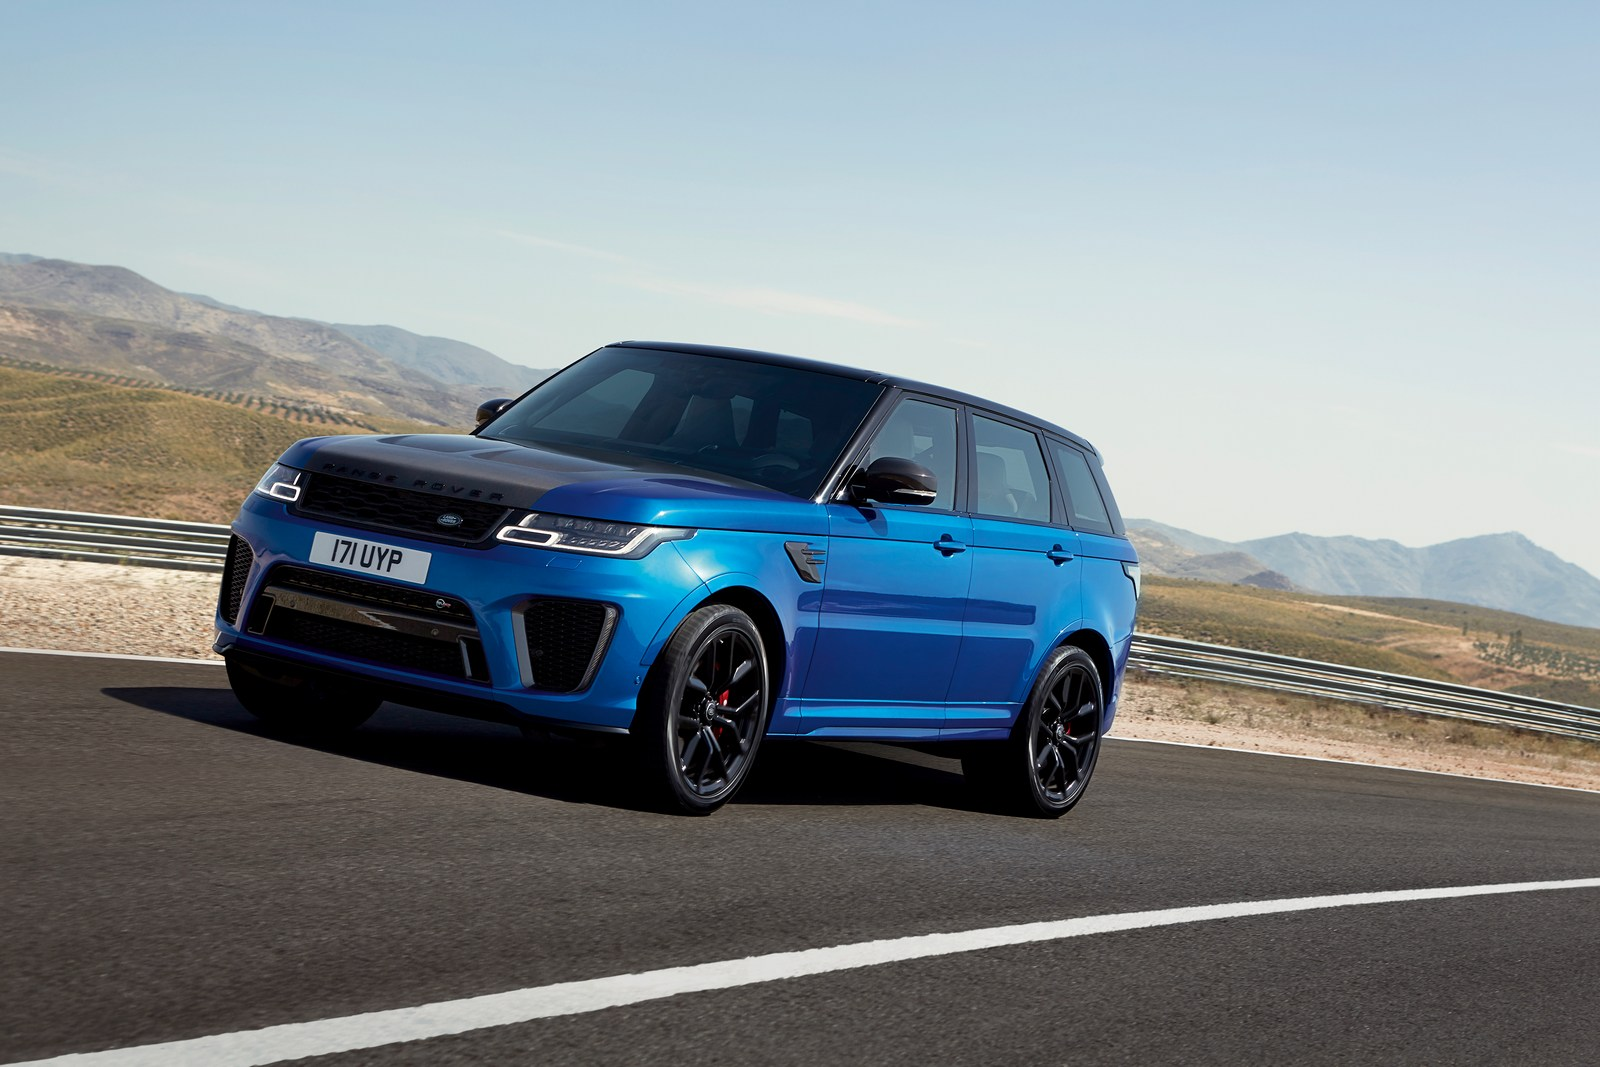 Ленд Ровер представил гибридный джип Range Rover Sport